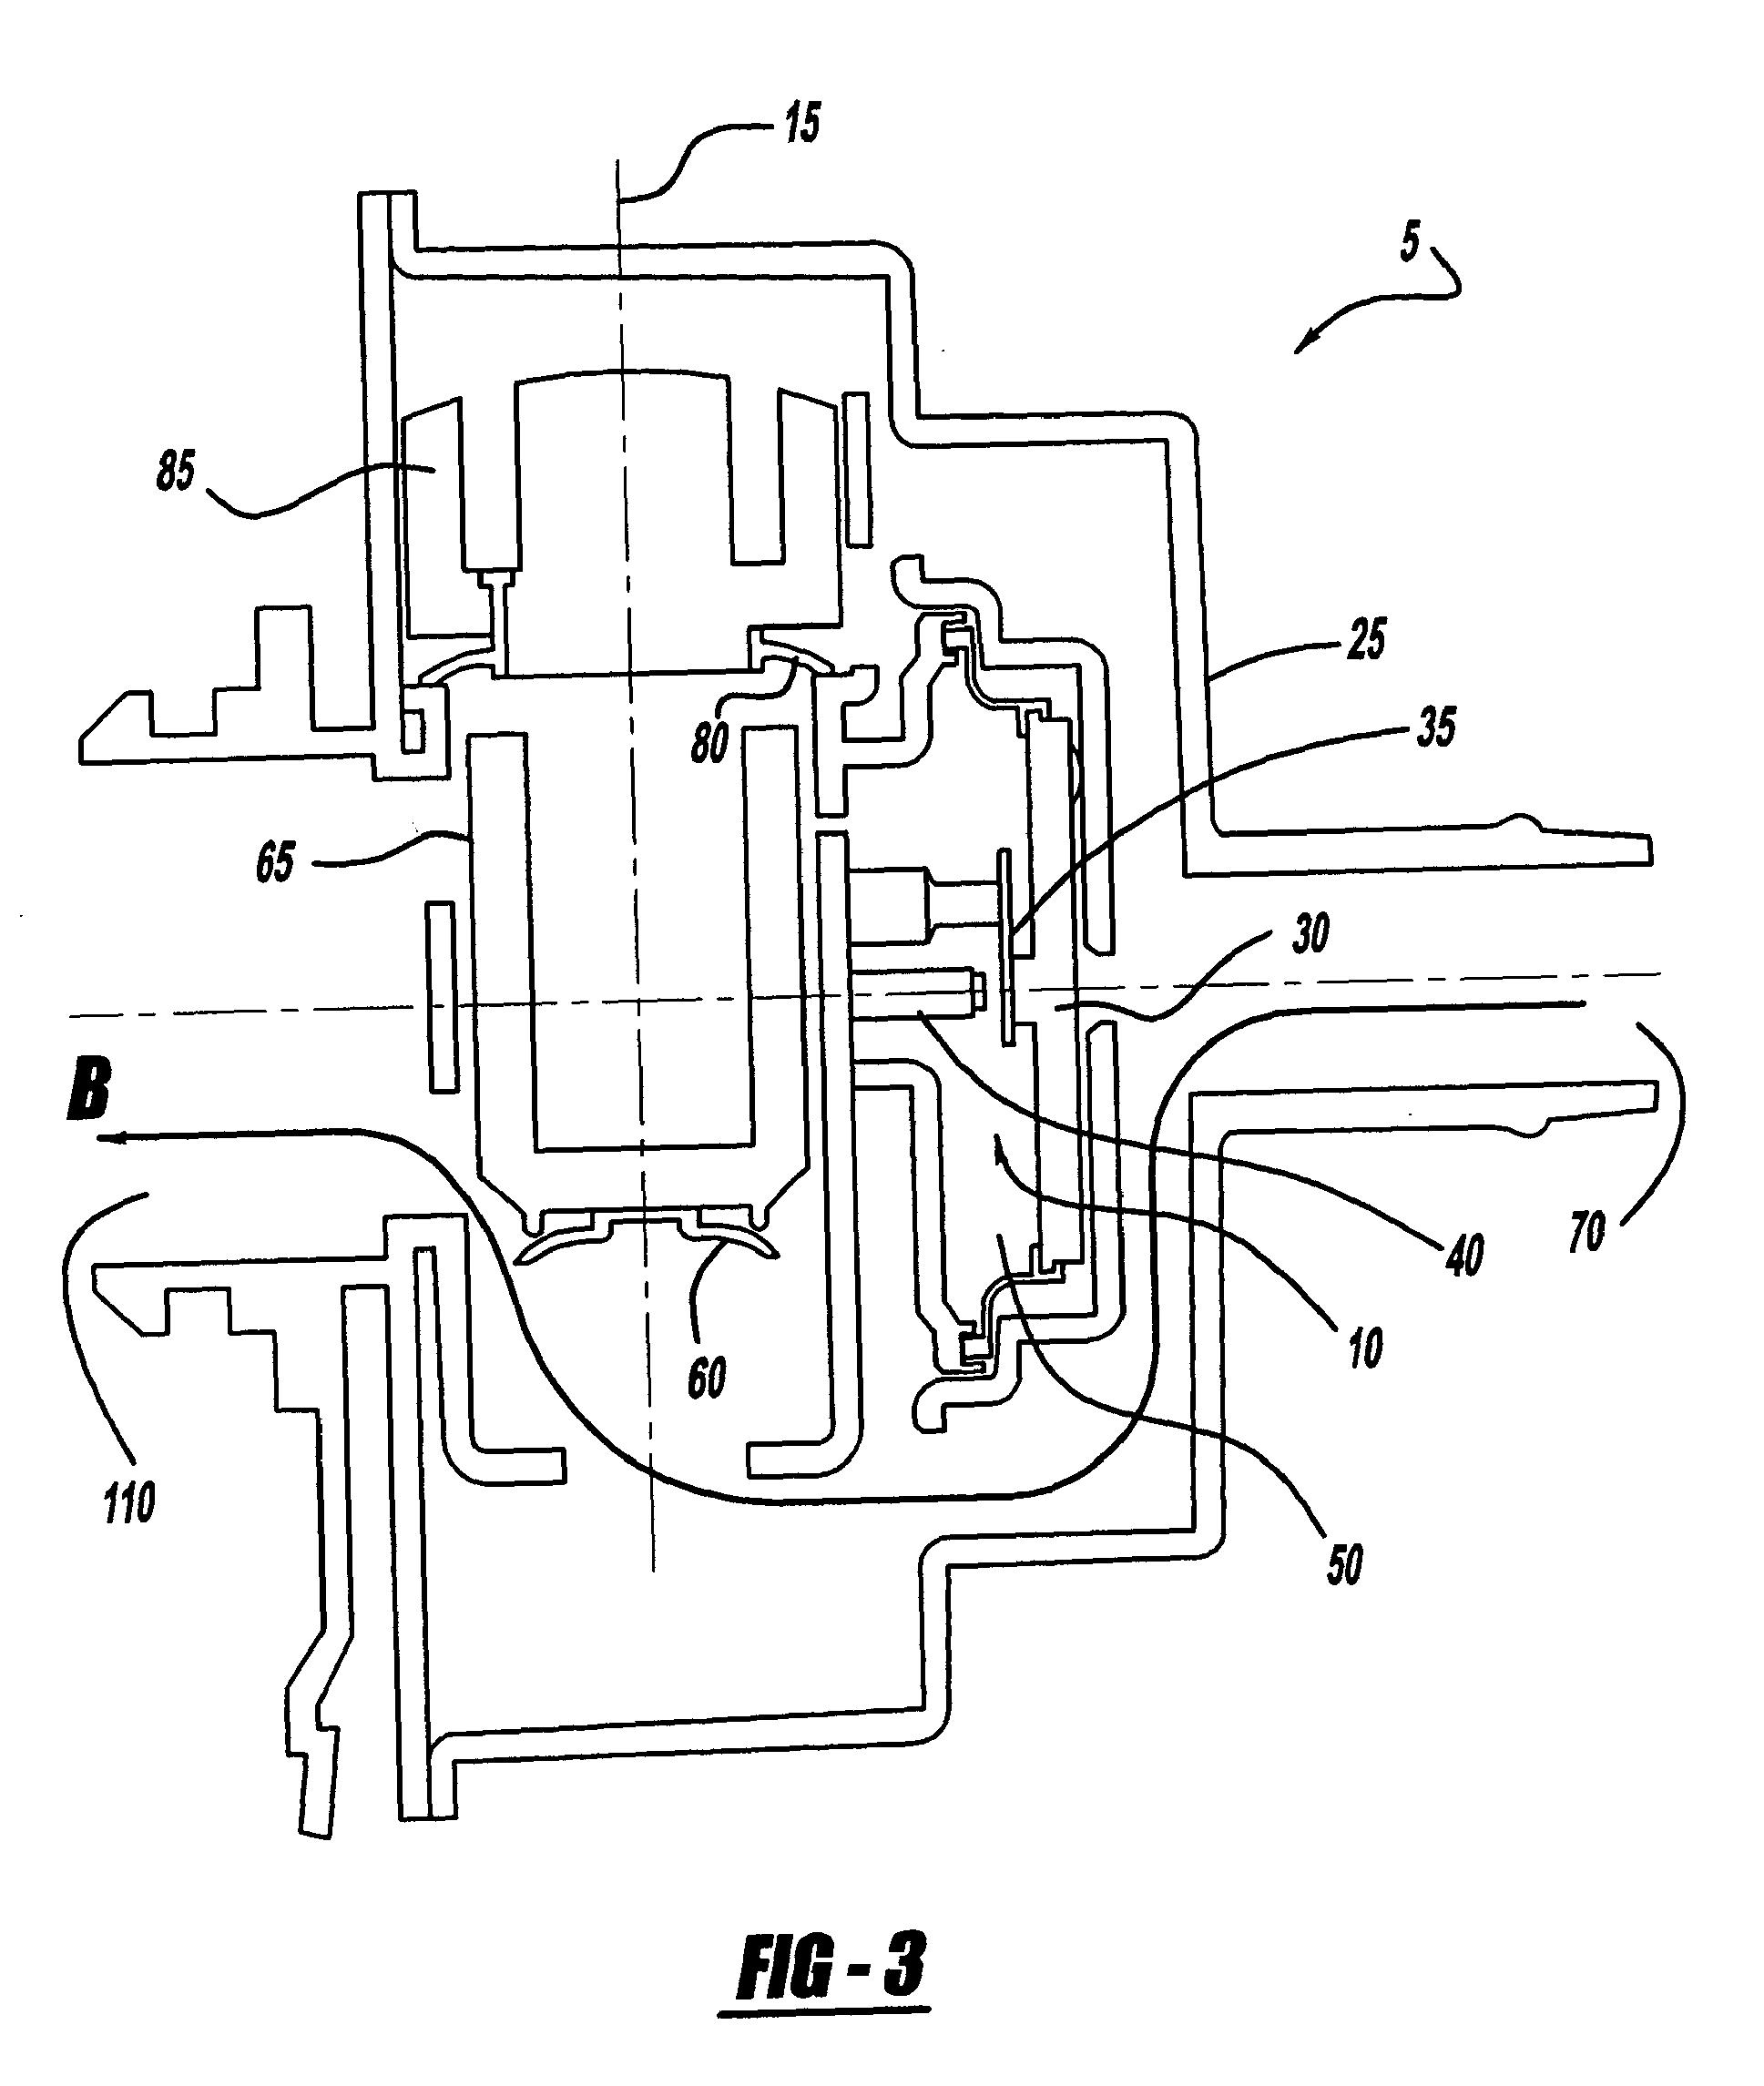 patent ep1722093a2